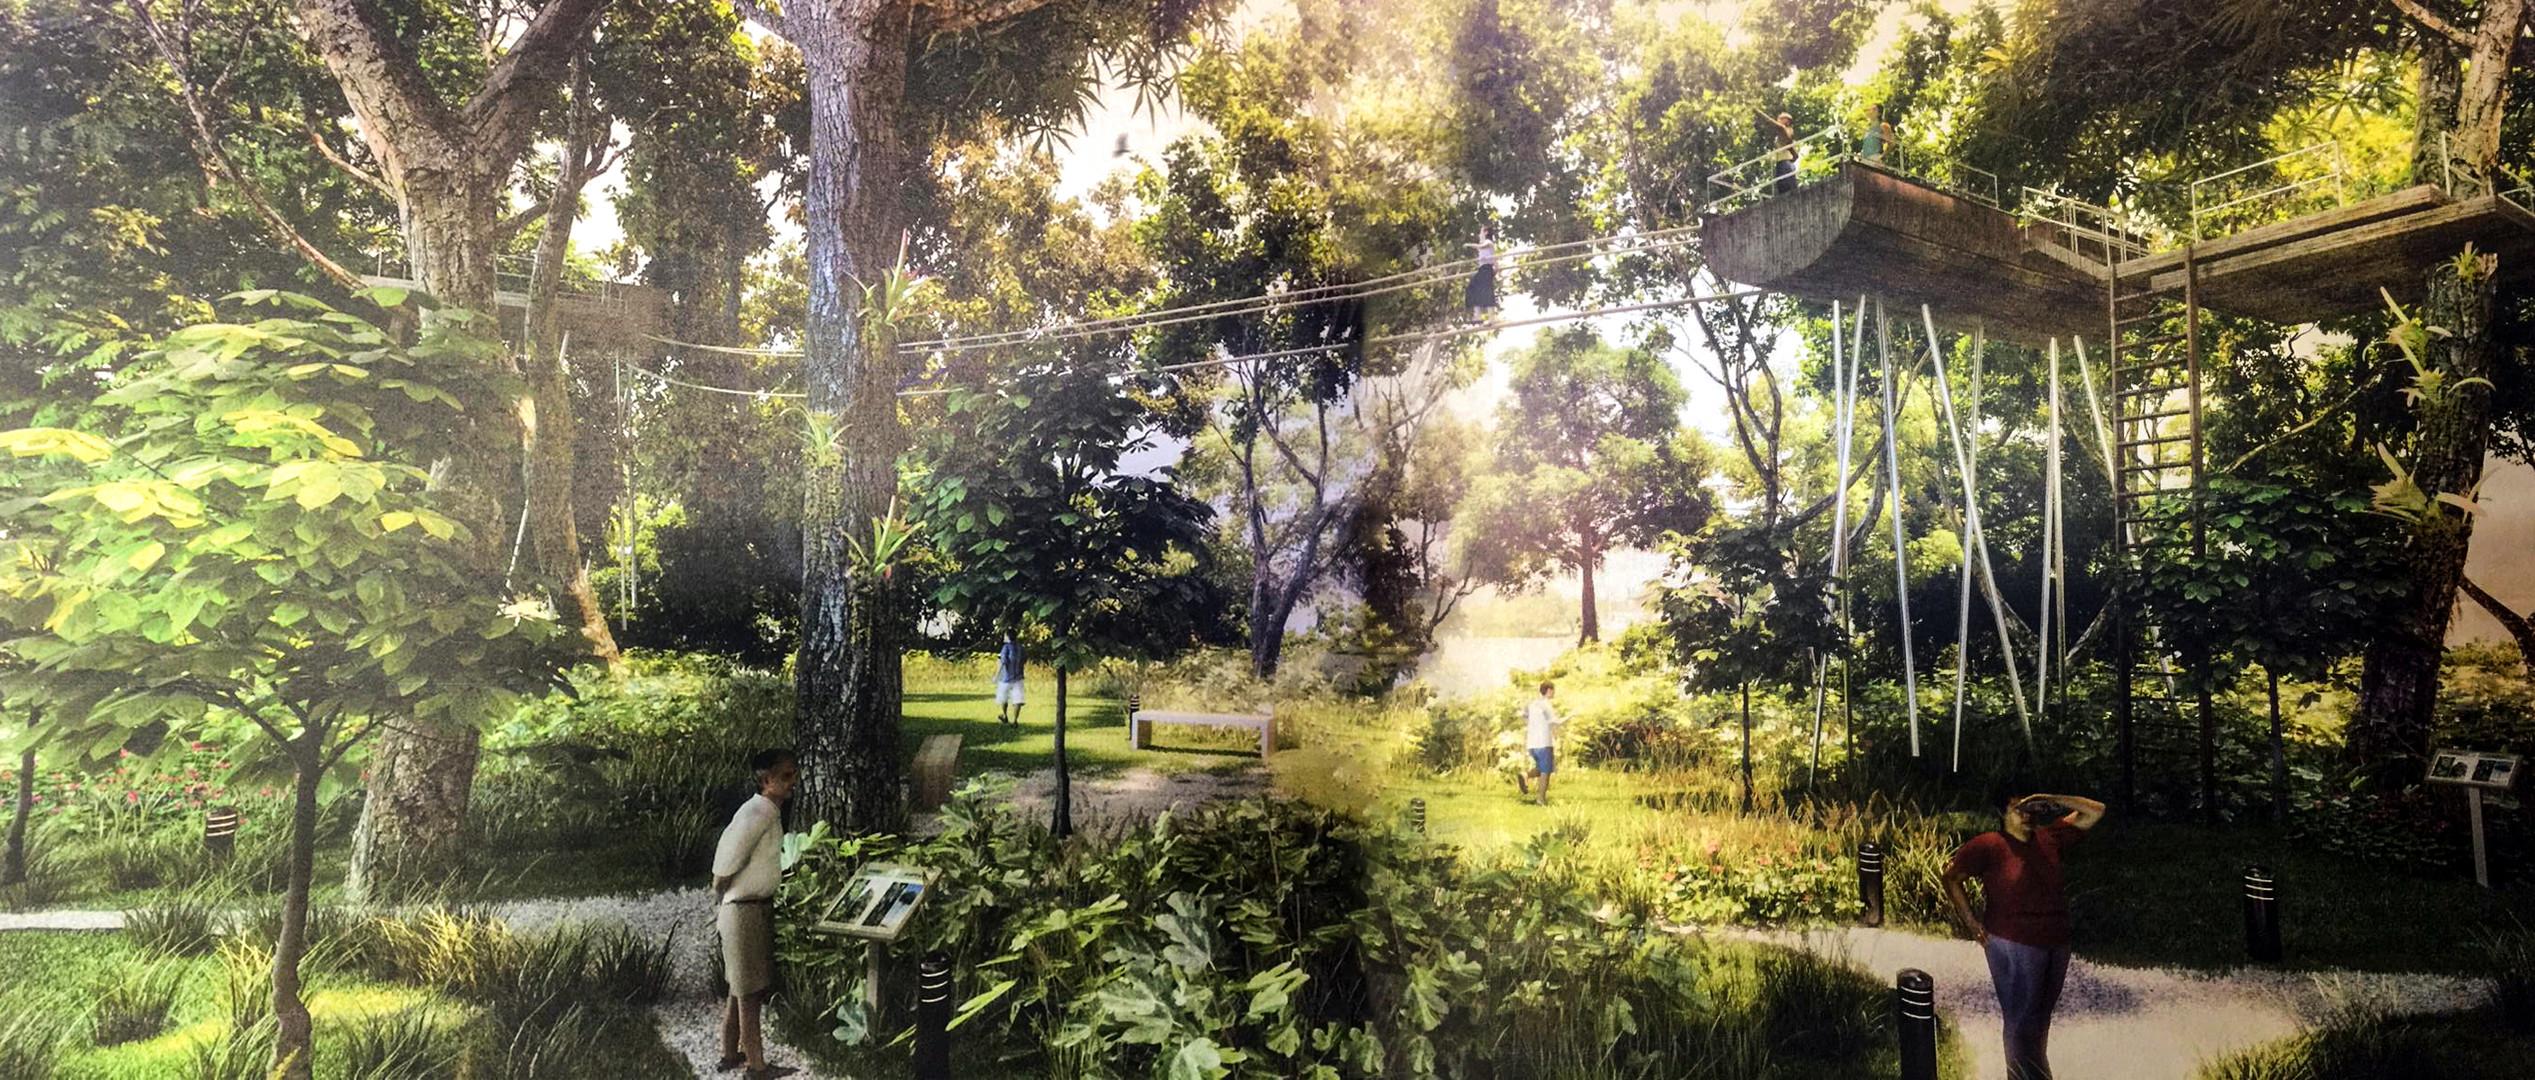 Park & Installations, Buzios